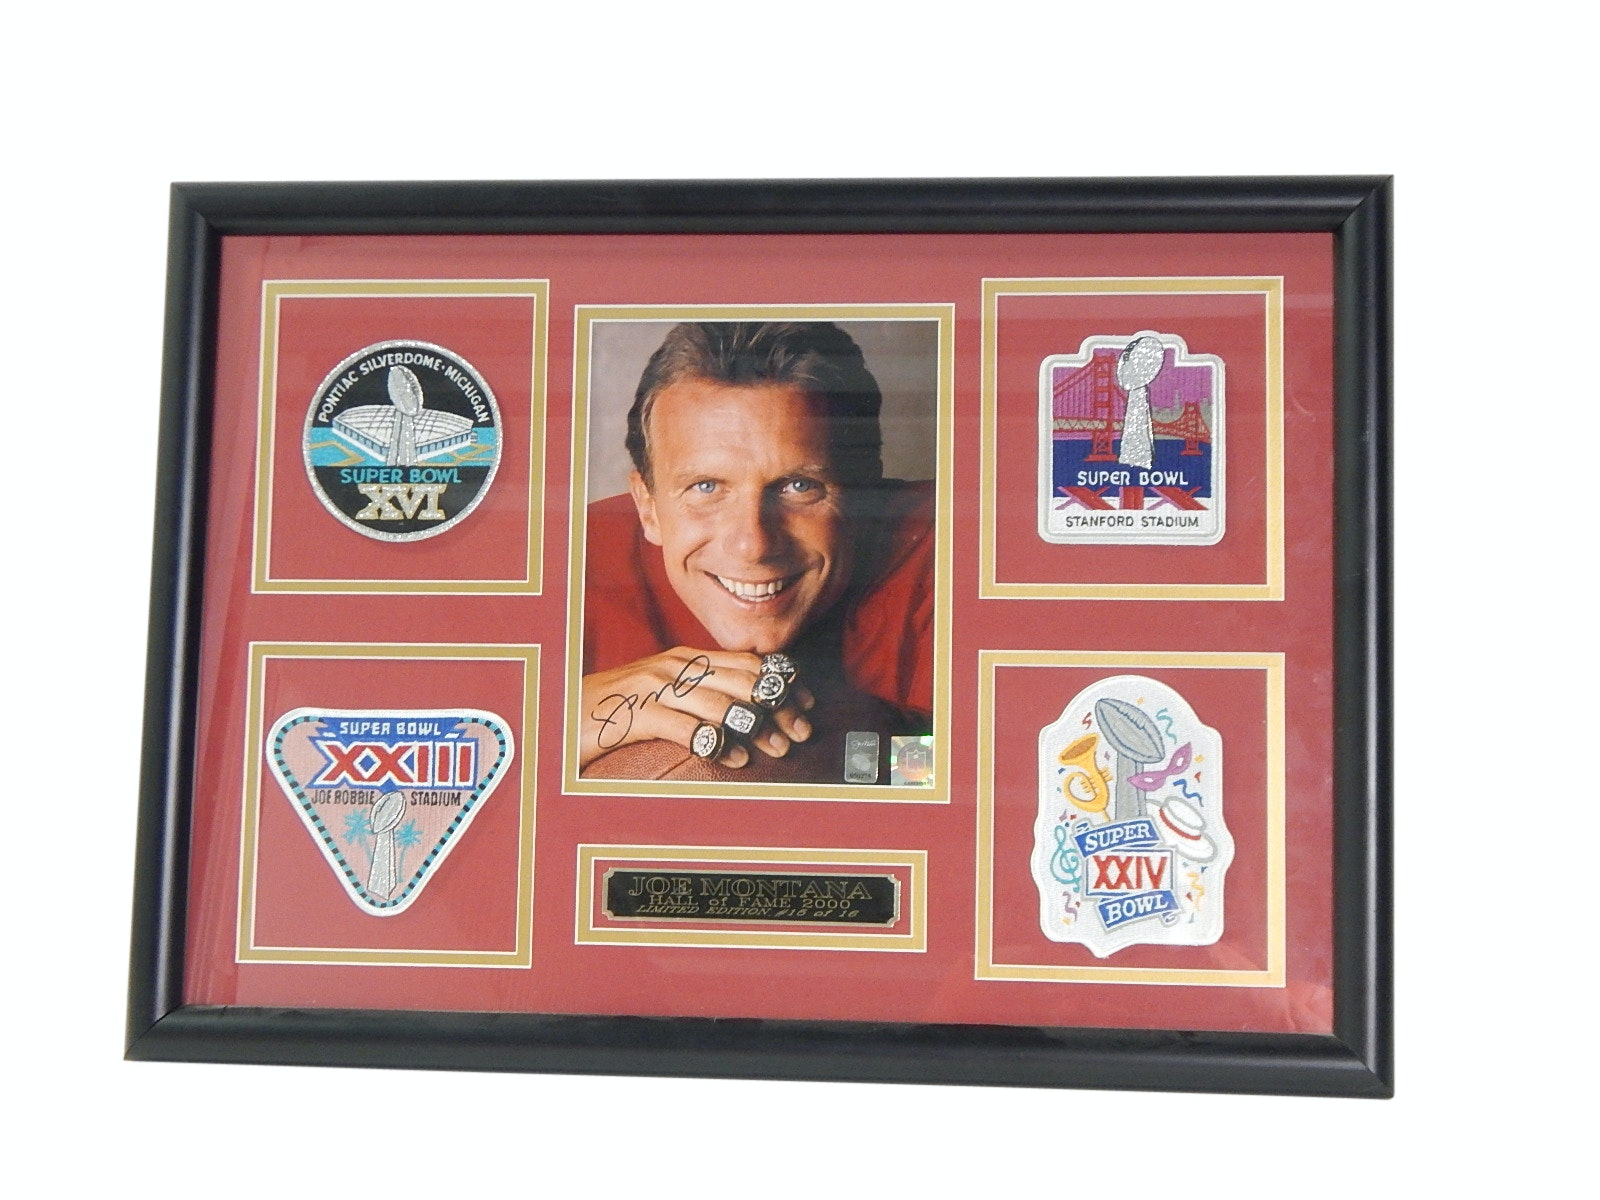 HOF Joe Montana Signed Photograph and Super Bowl Patch Framed Display